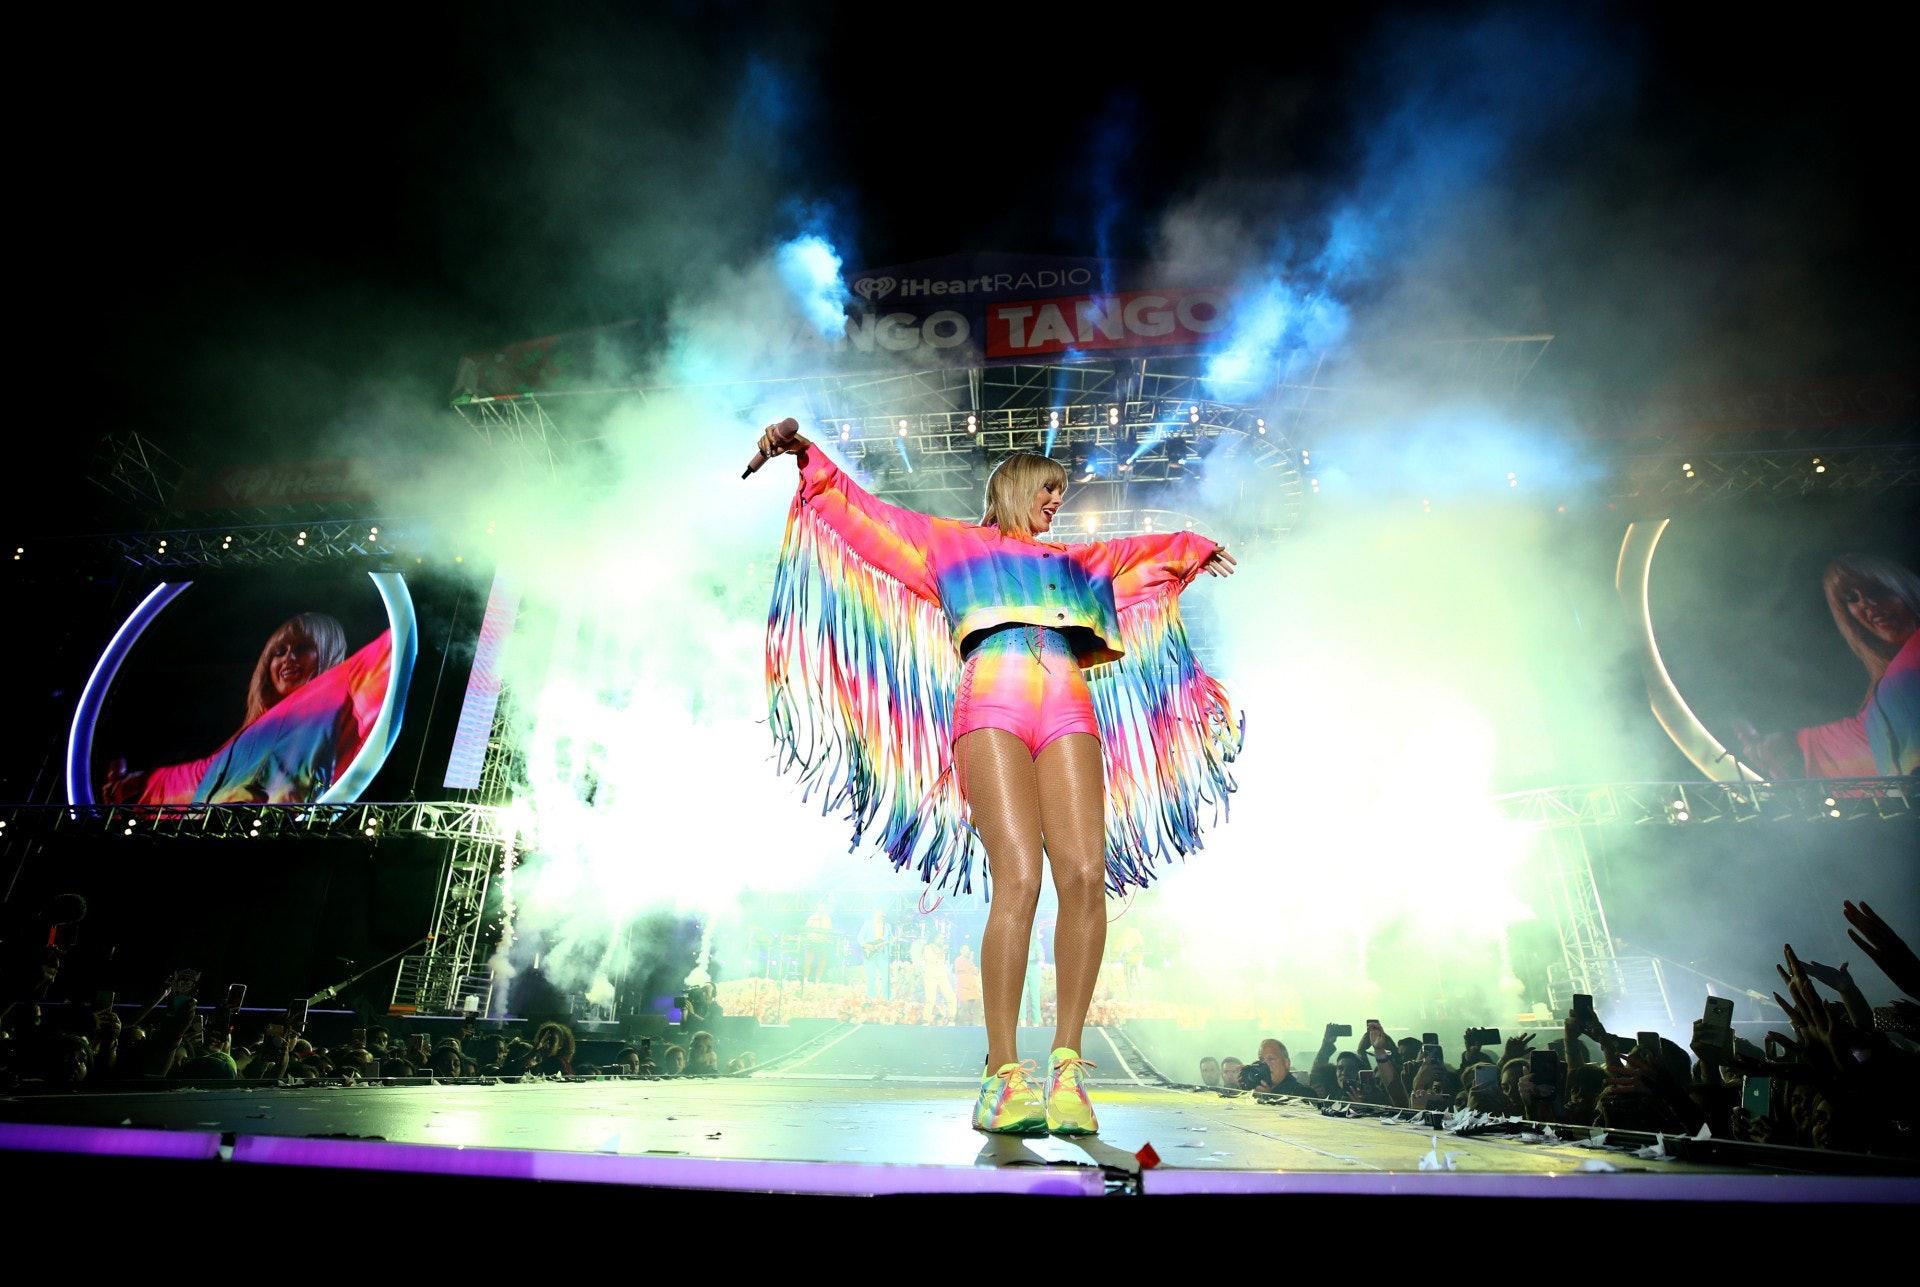 Taylor身材非常高挑,肥少少都不太覺眼。(Getty Images)